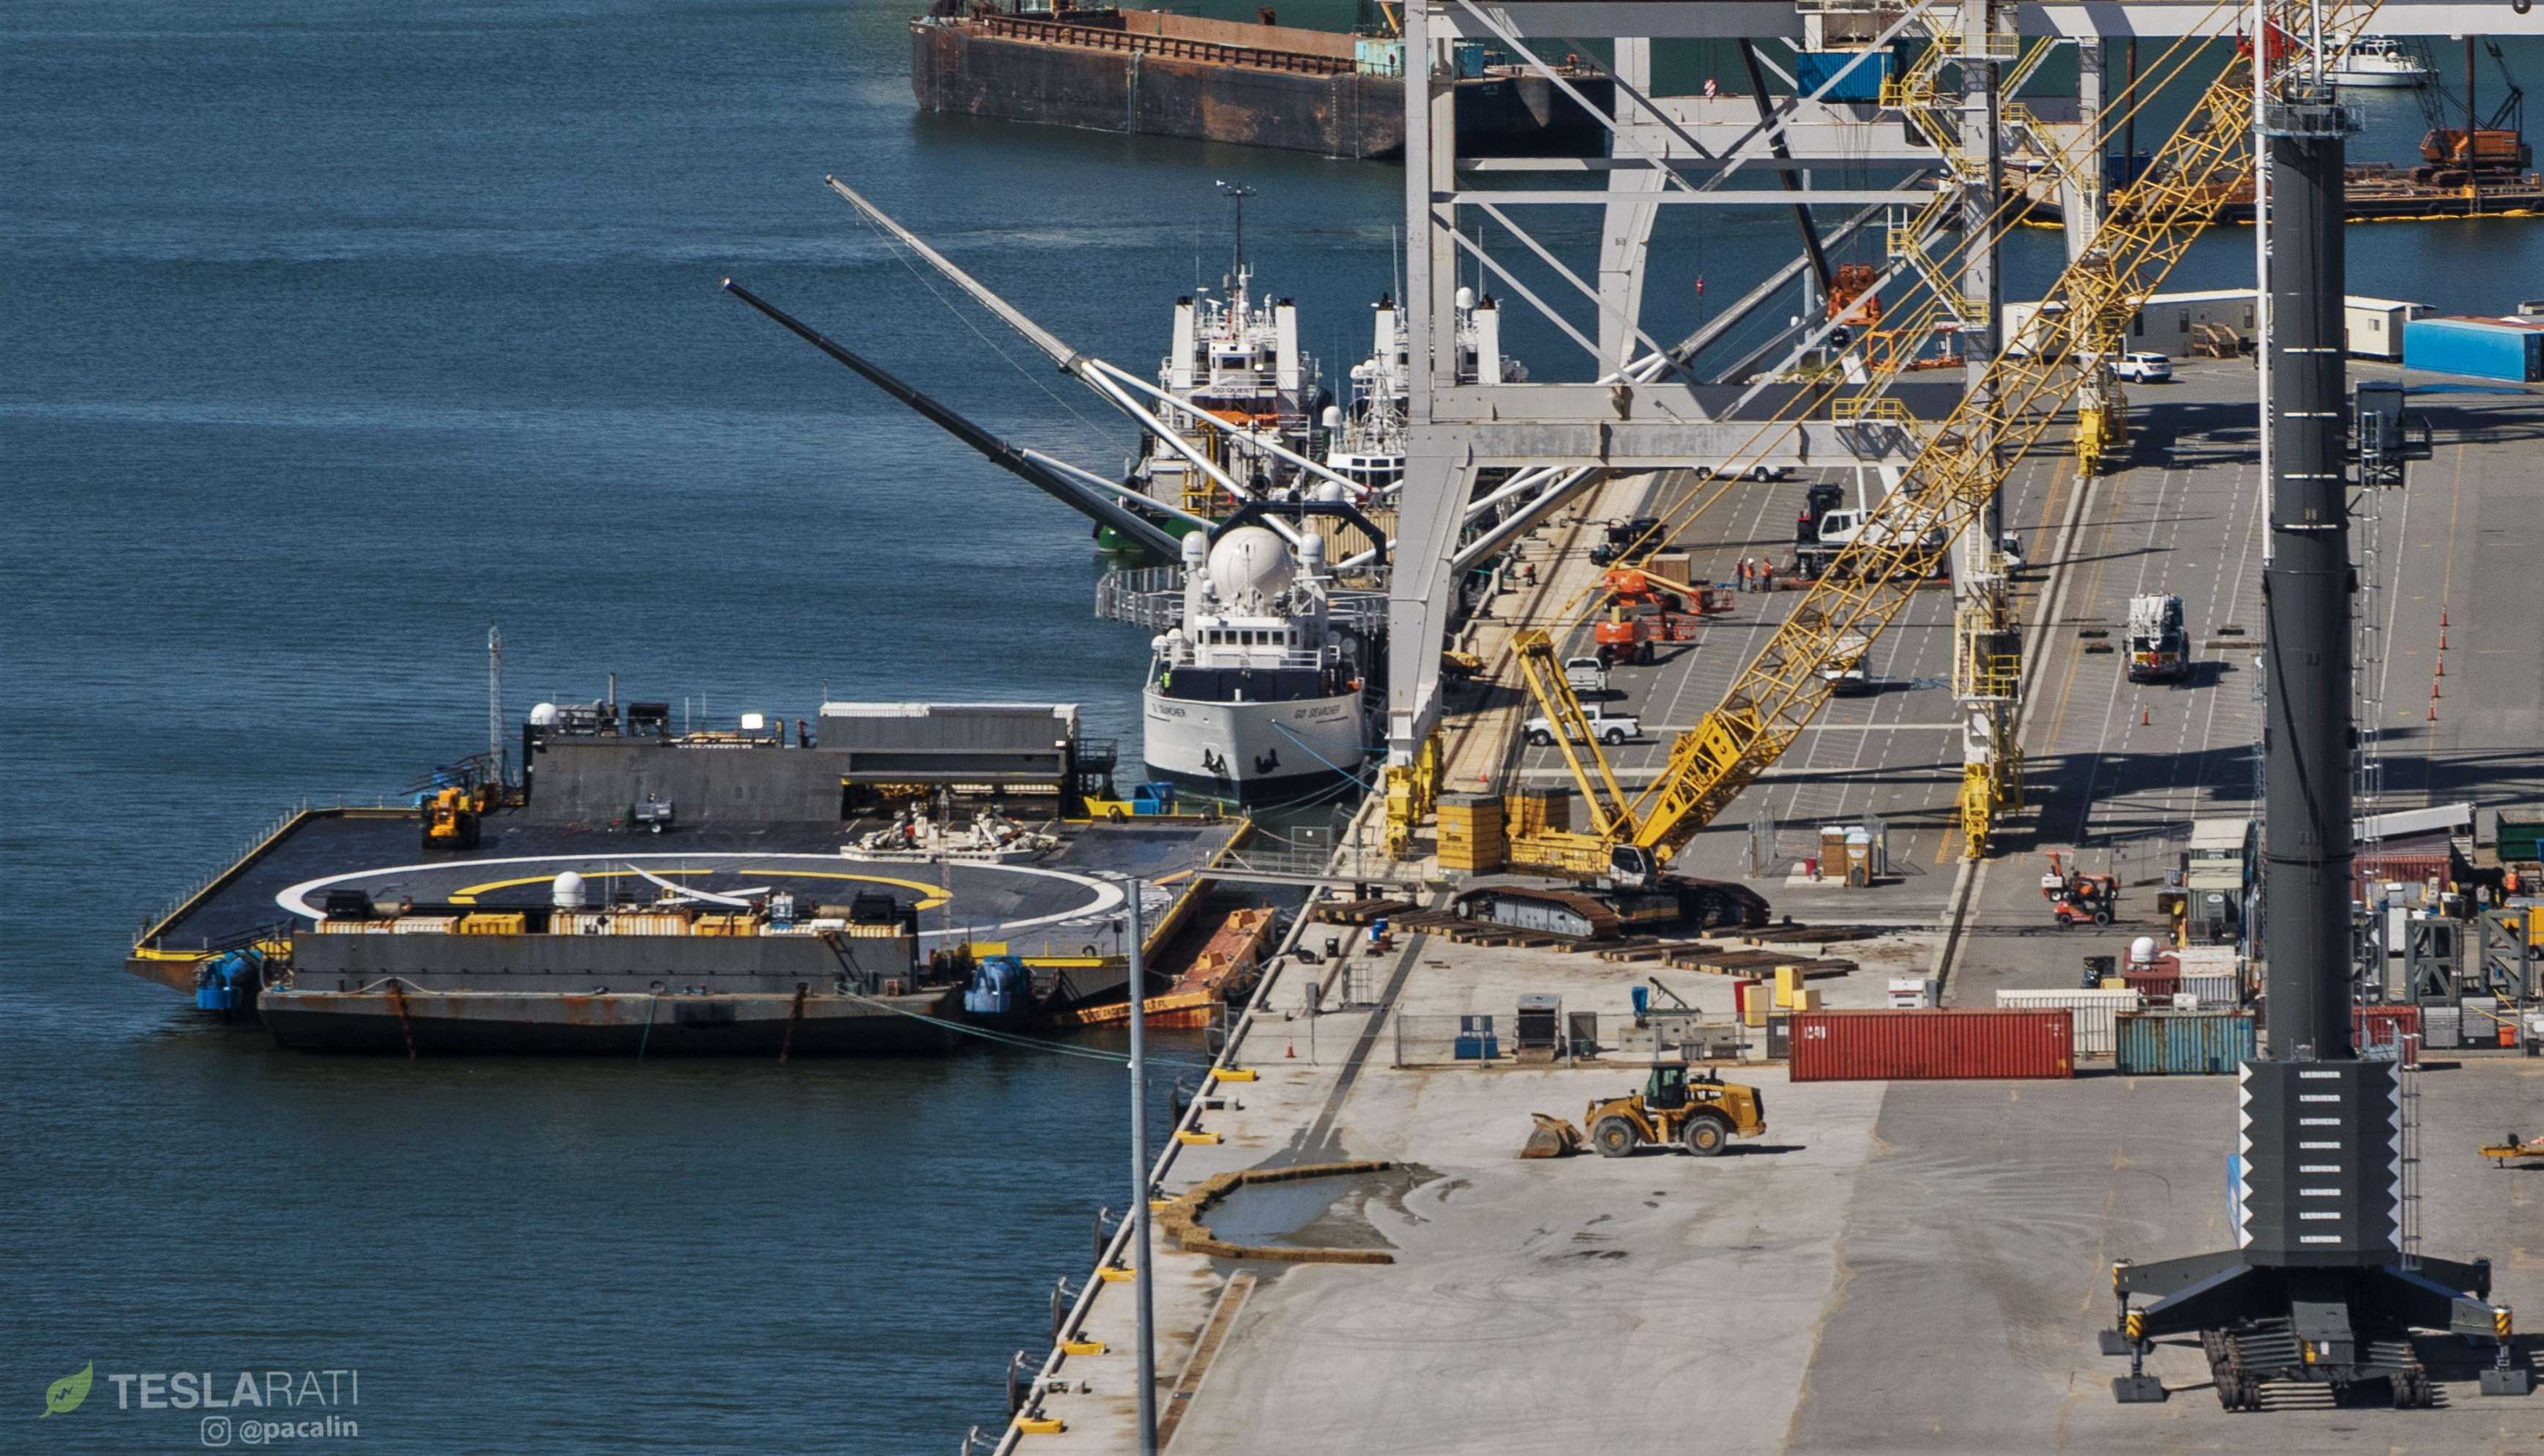 SpaceX East Coast fleet Mr Steven OCISLY Searcher 021419 (Pauline Acalin) 2 (c)